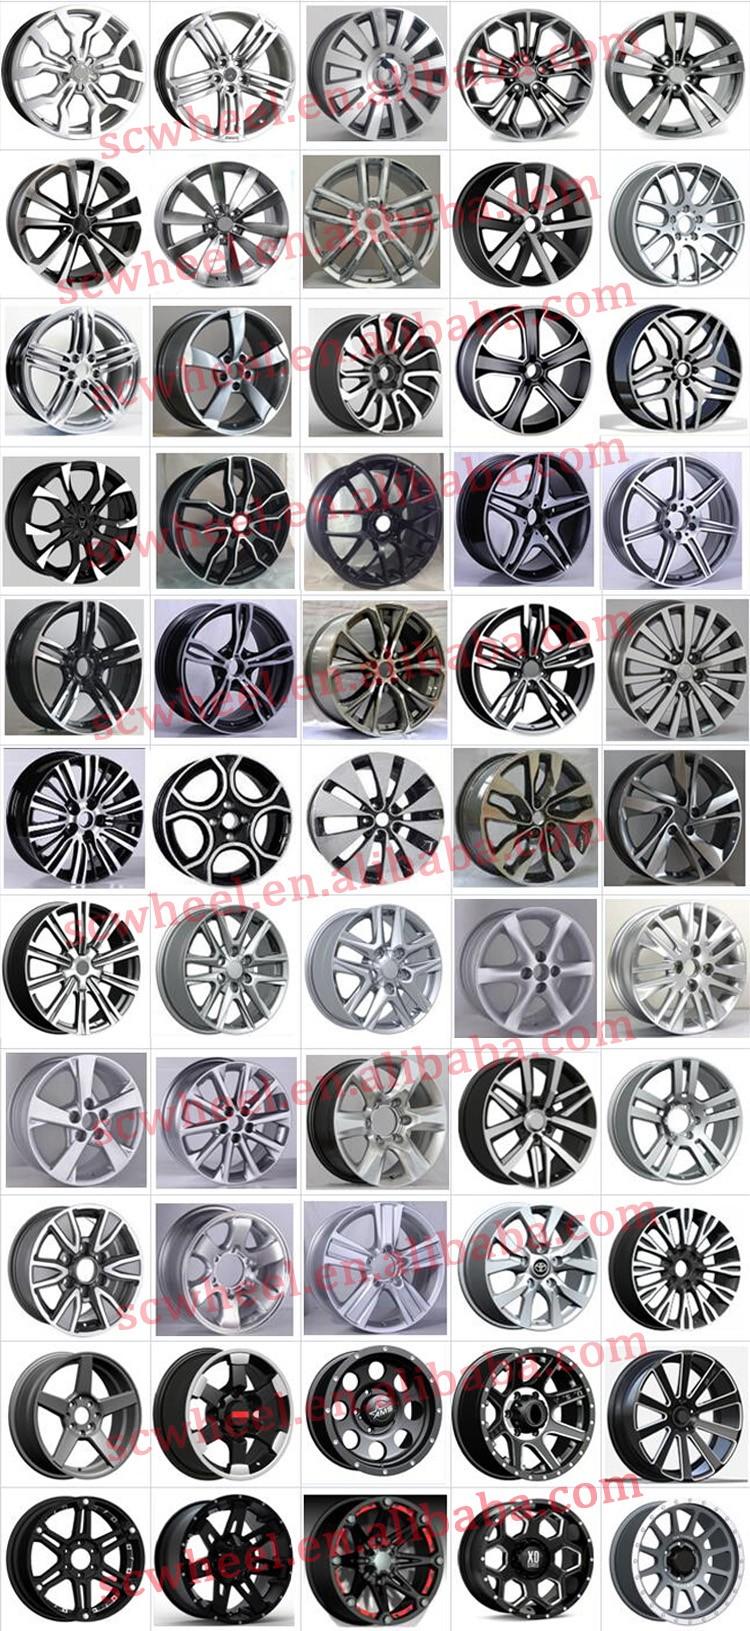 13-inch Alloy Wheel For Car Replica New Design 4x4 Racin Made In ...